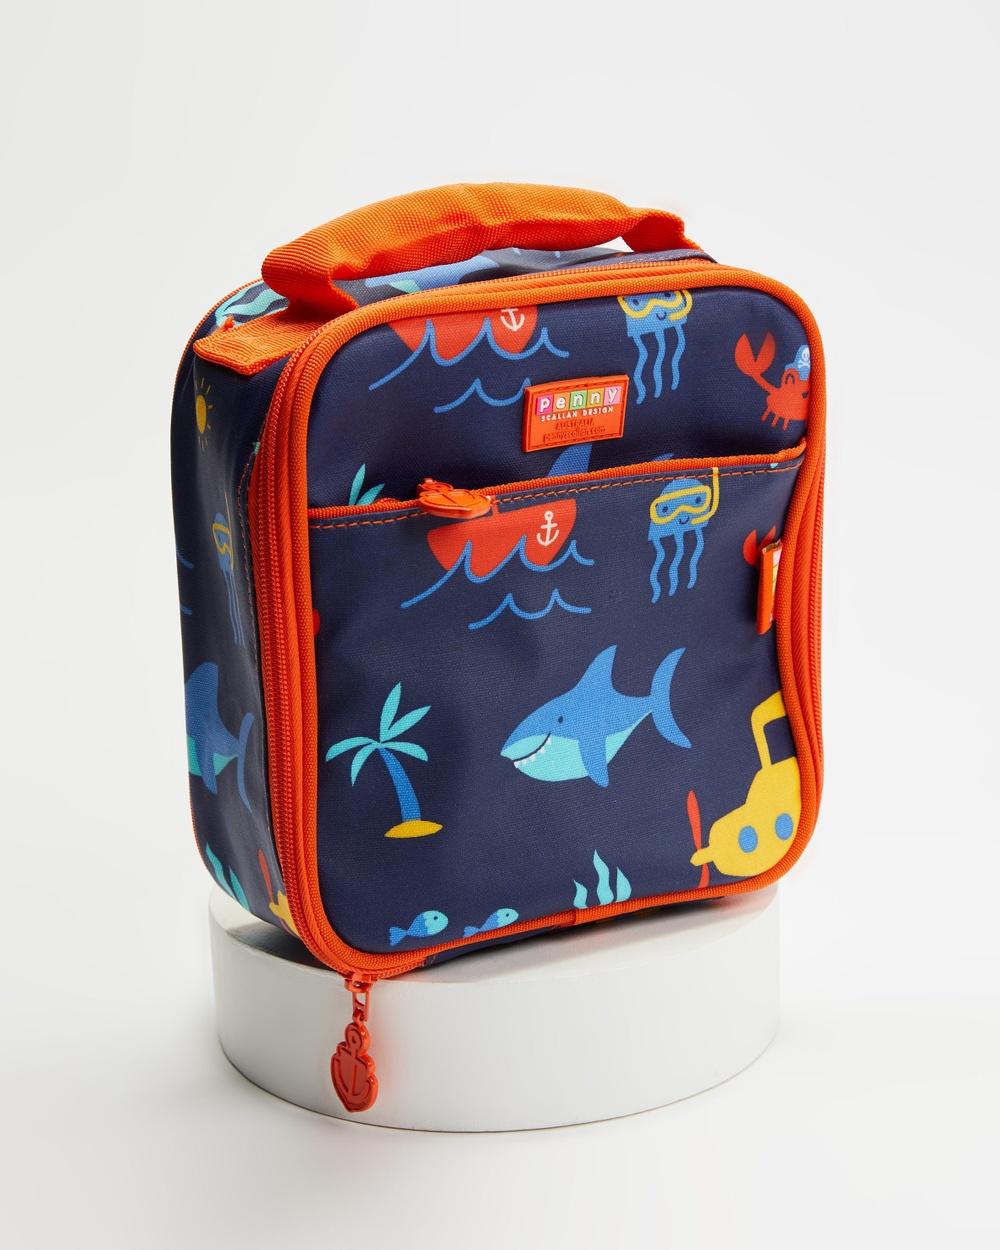 Penny Scallan Lunchbox School Kids Home Anchors Away